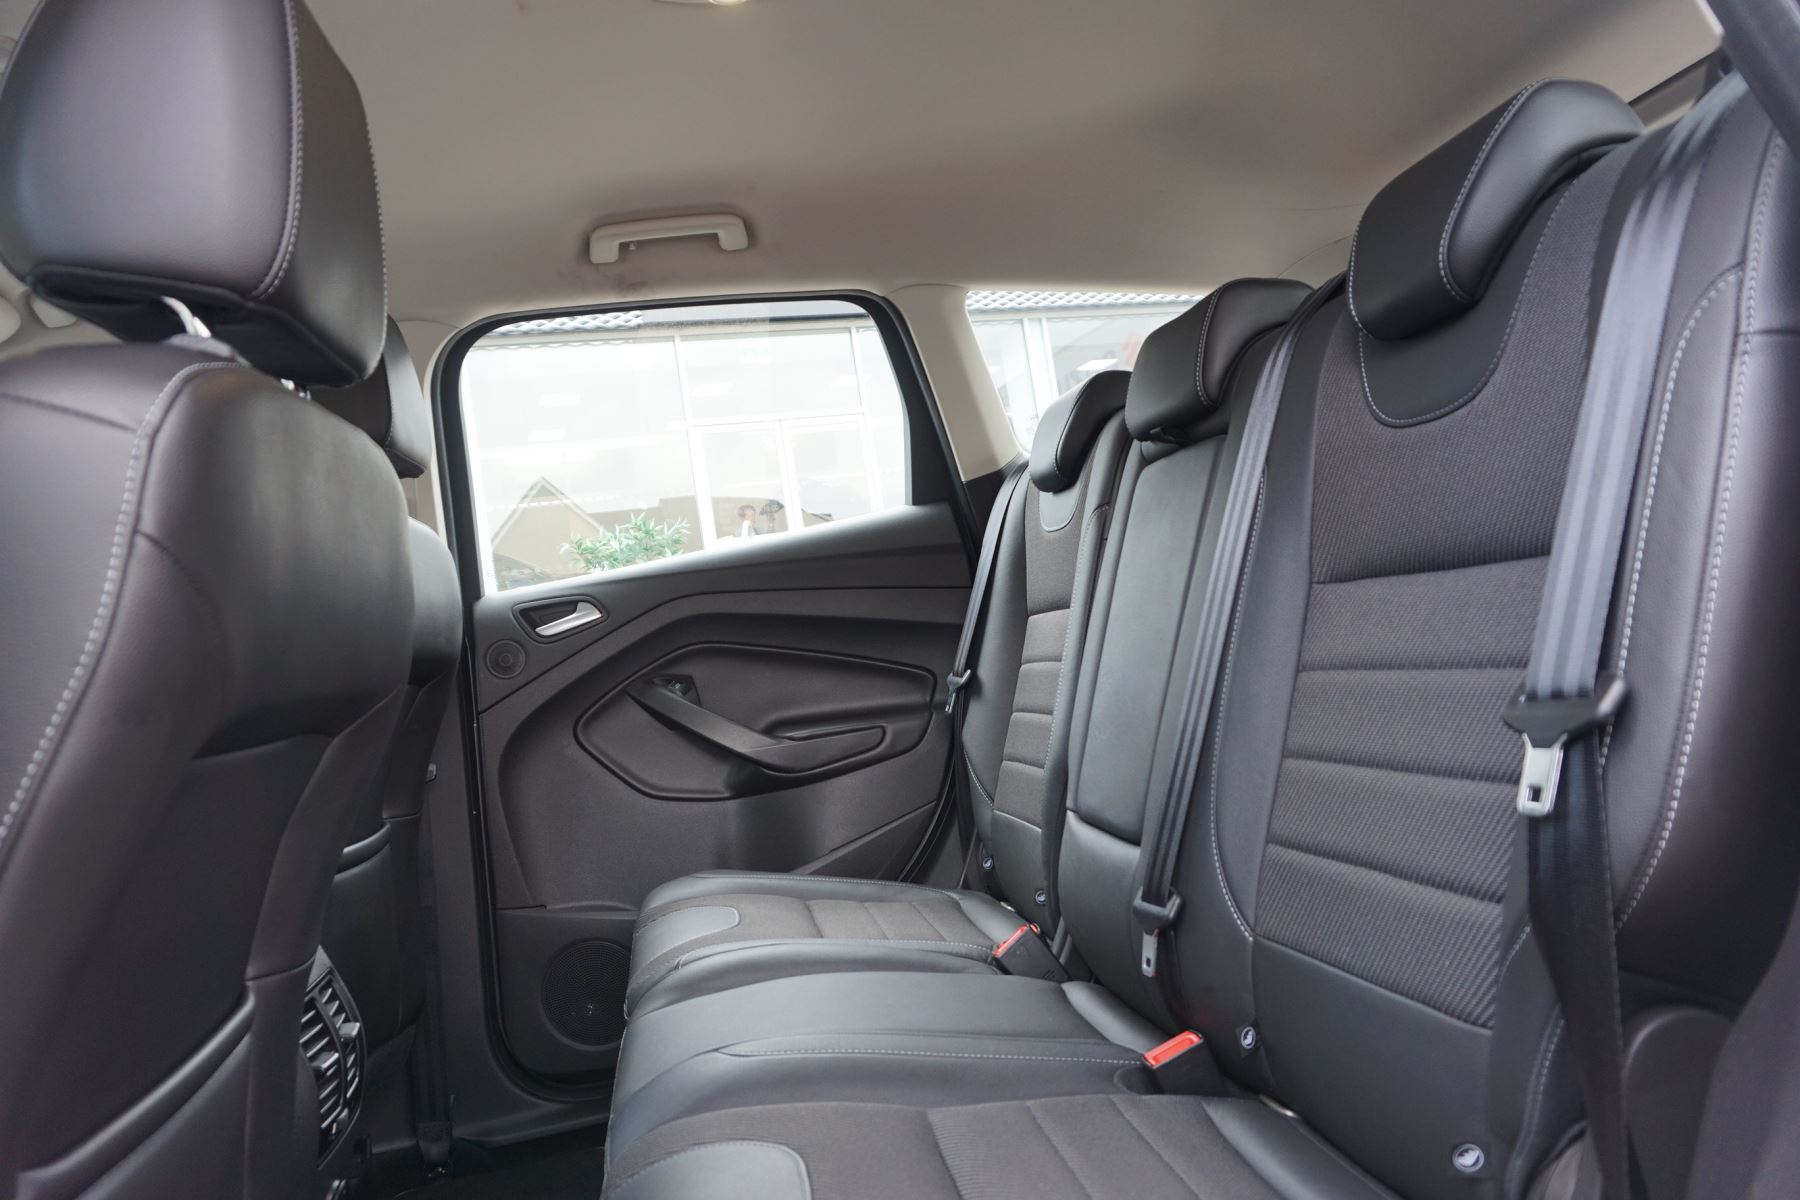 Ford Kuga 2.0 TDCi Titanium 2WD image 9